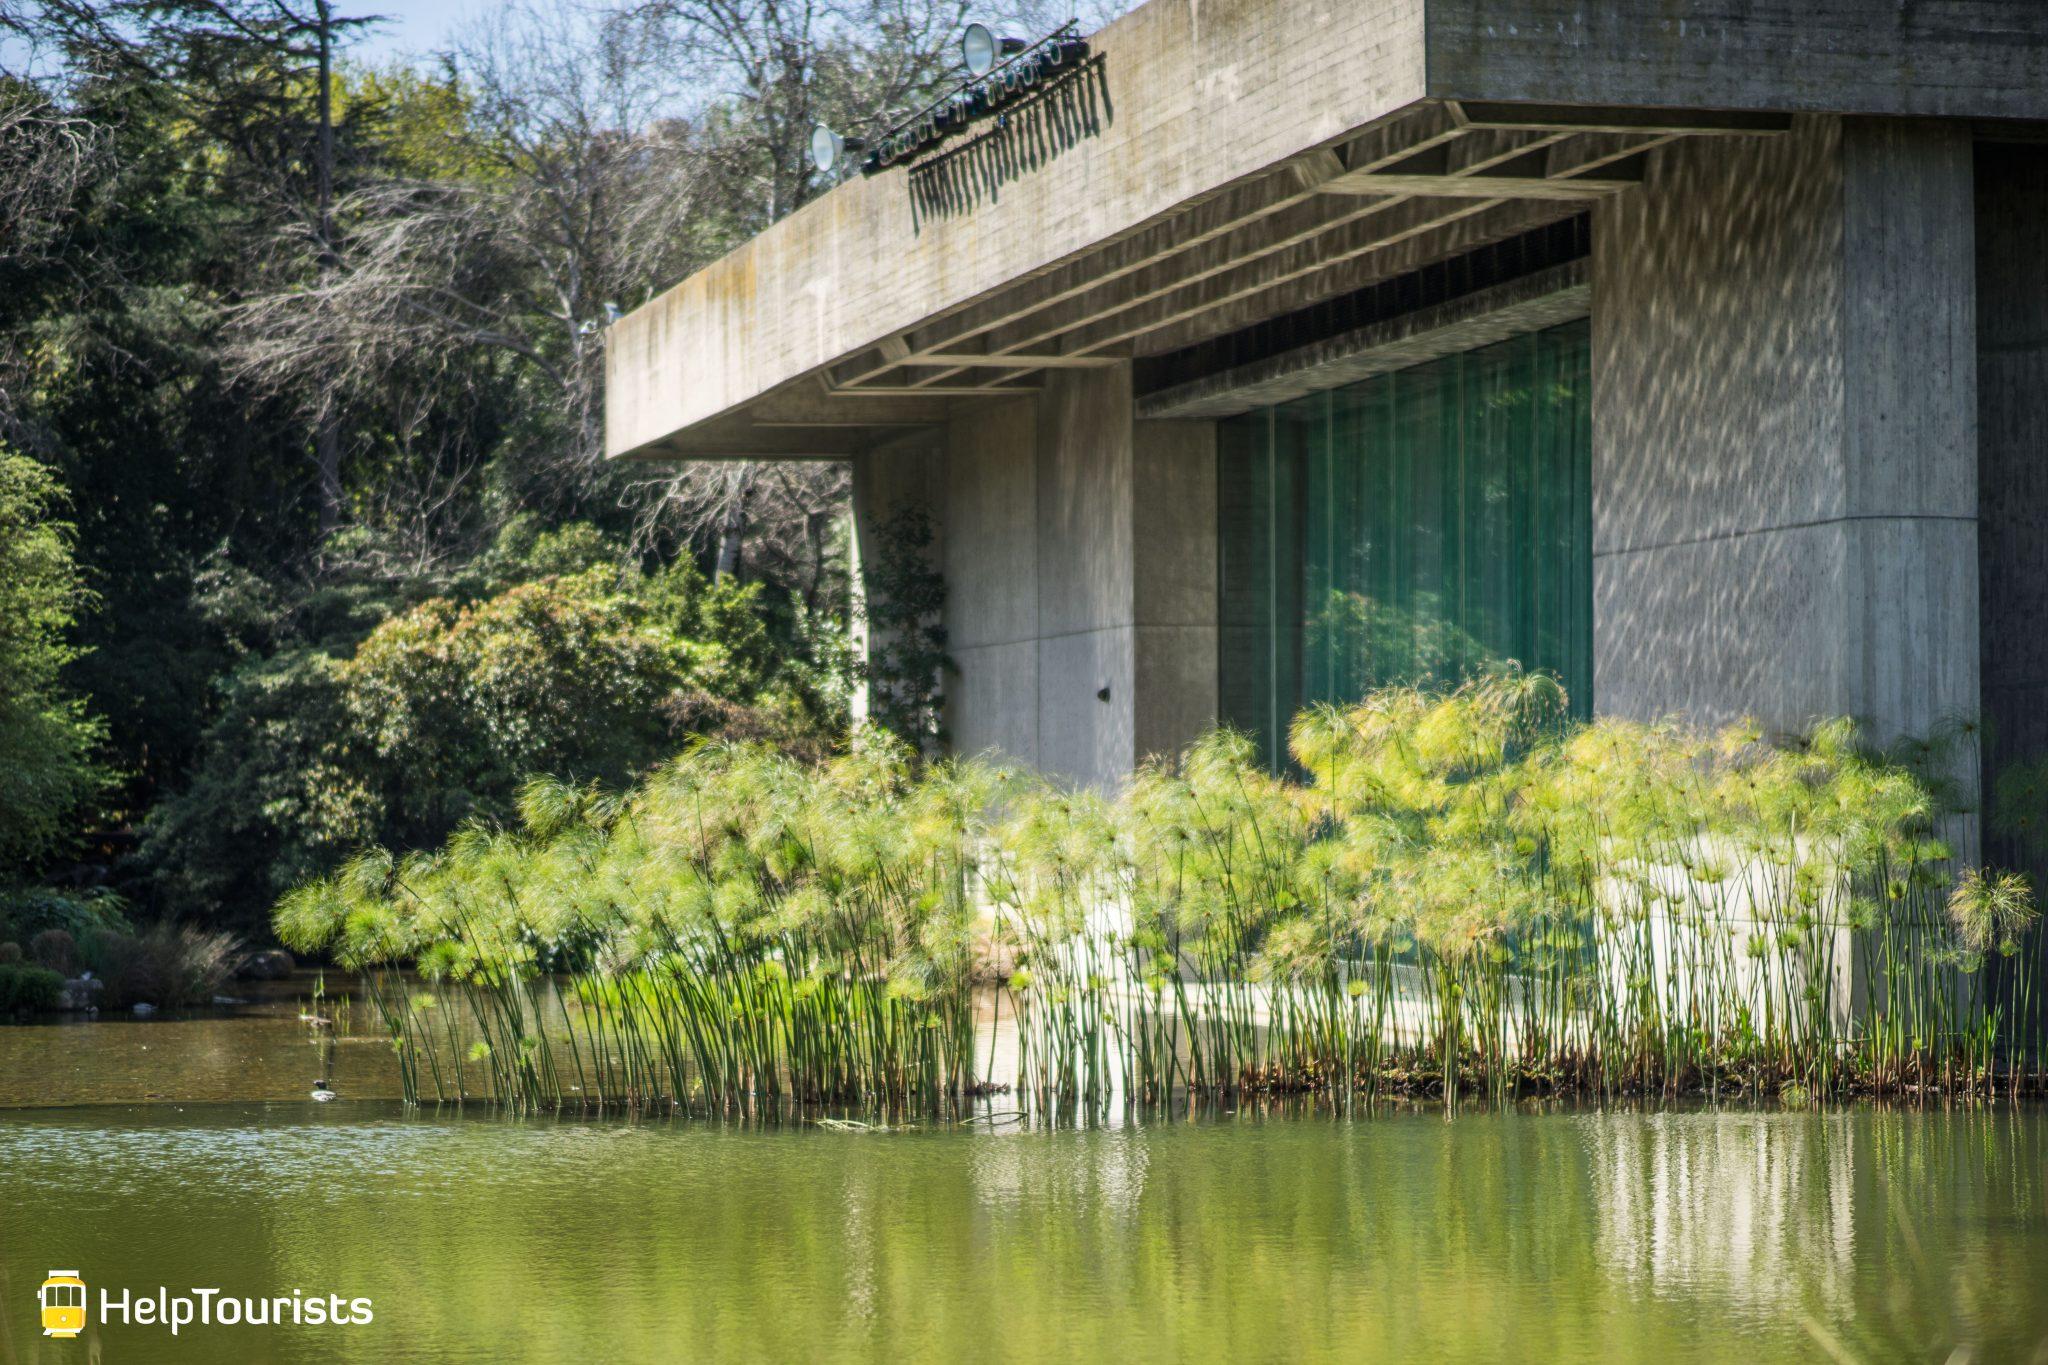 Lissabon_Museu-Calouste-Gulbenkian_Gebaeude